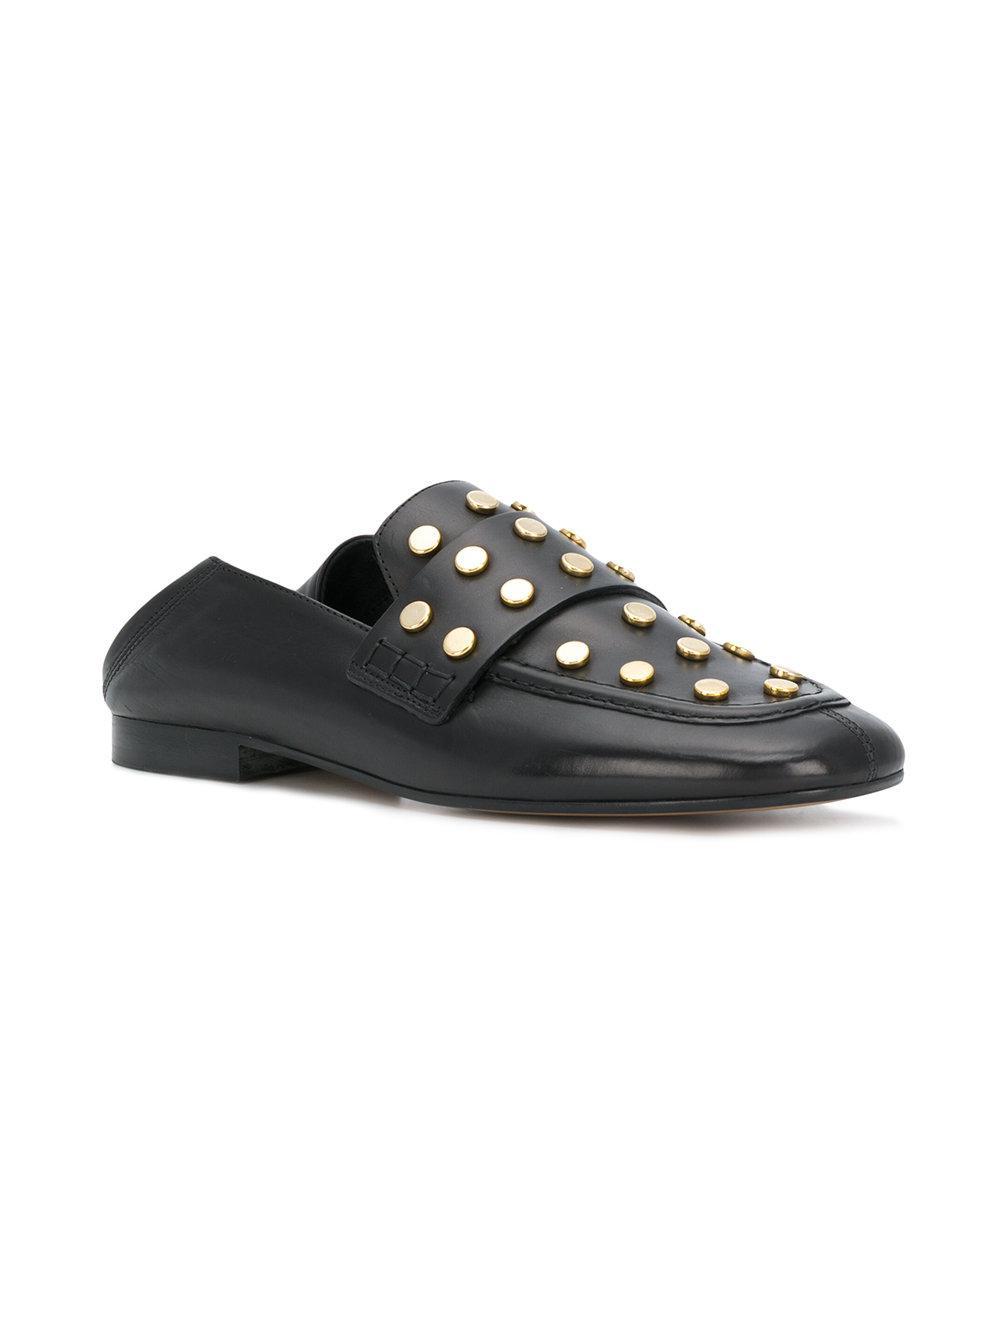 847b5b3c3ca Isabel Marant Feenie Loafers in Black - Save 30% - Lyst